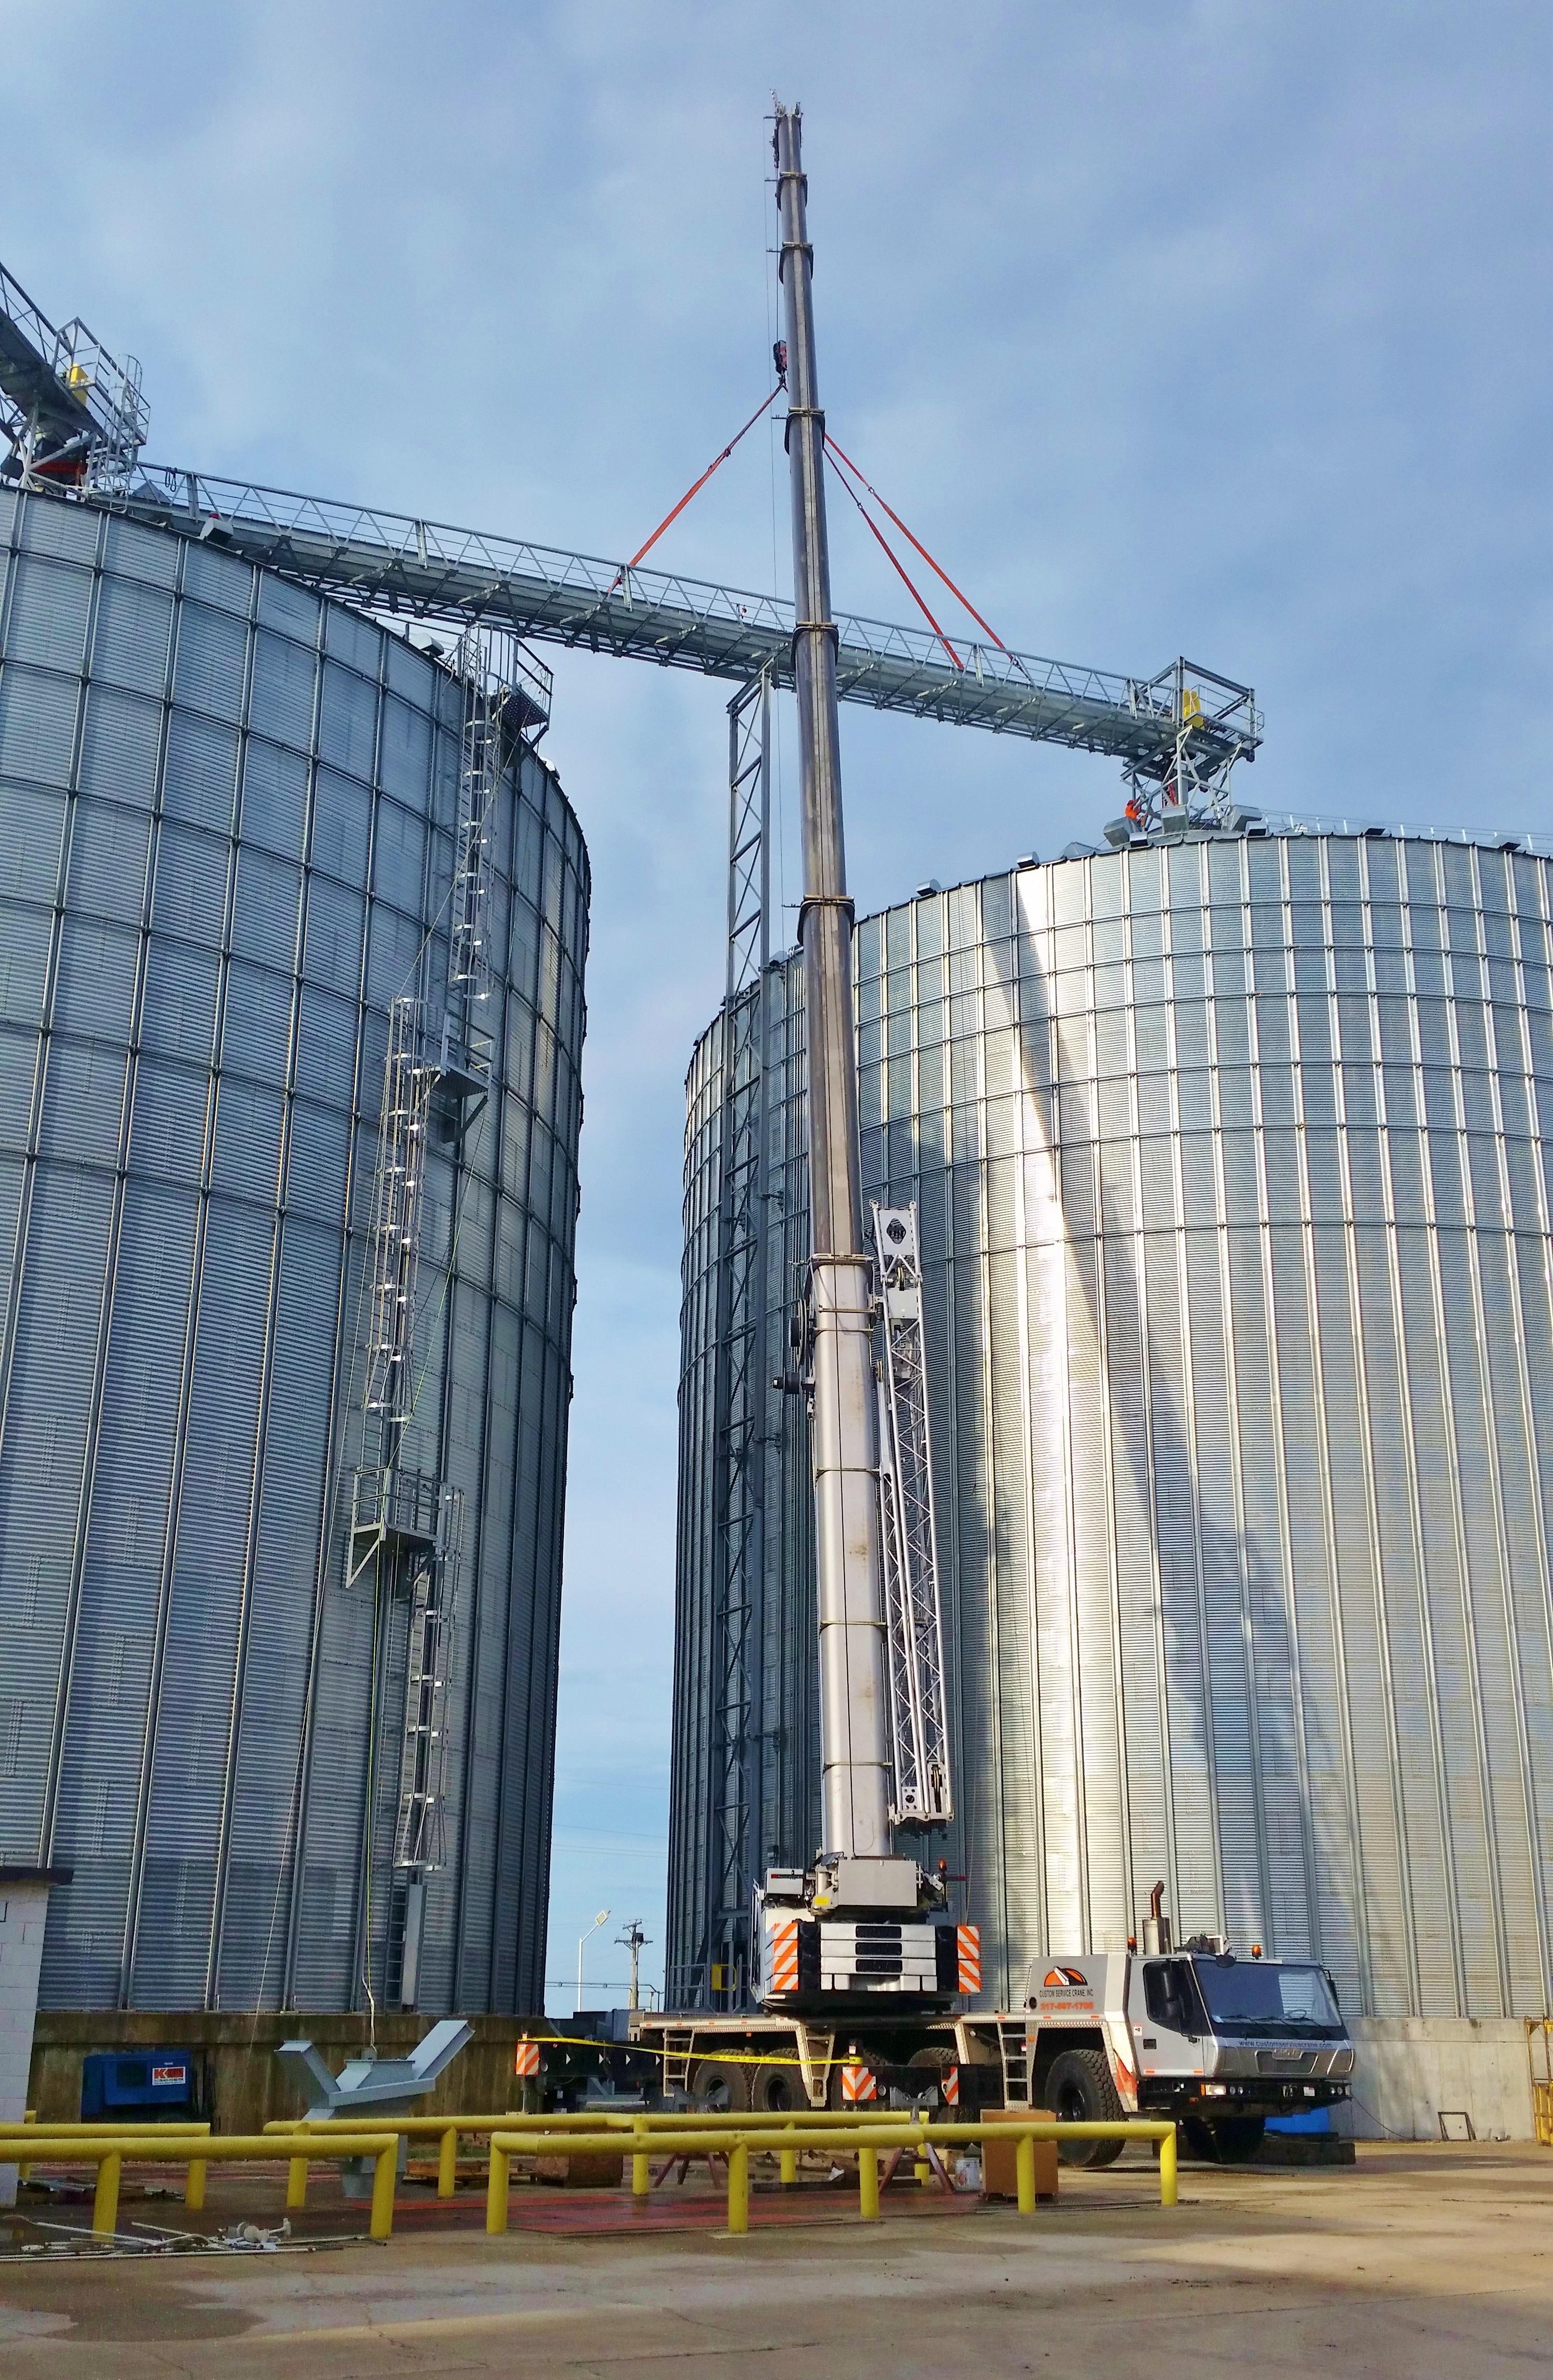 275 ton hydraulic crane hoisting a bridge truss at grain bins